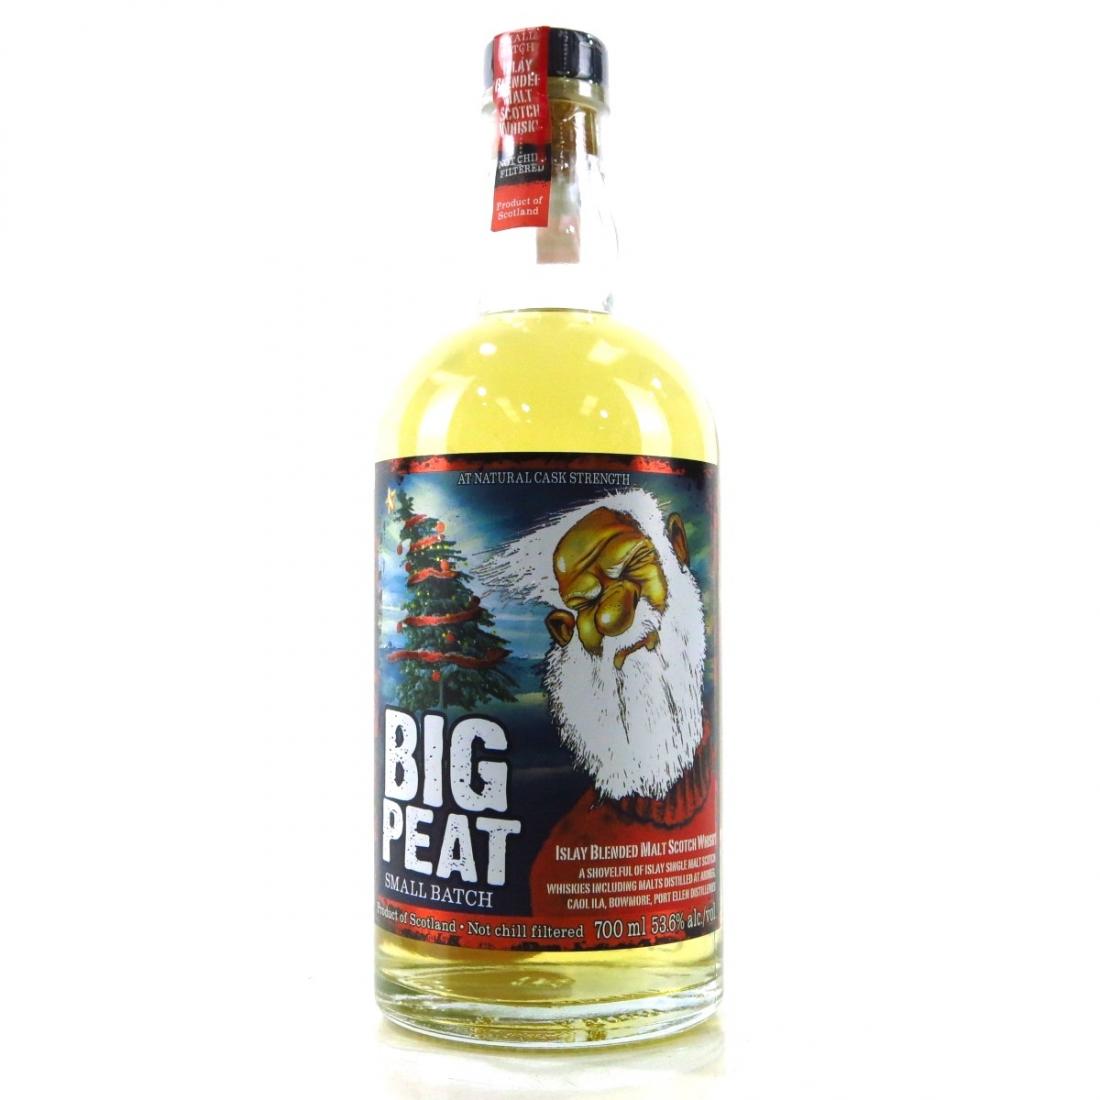 Big Peat Christmas Cask Strength 2012 Edition